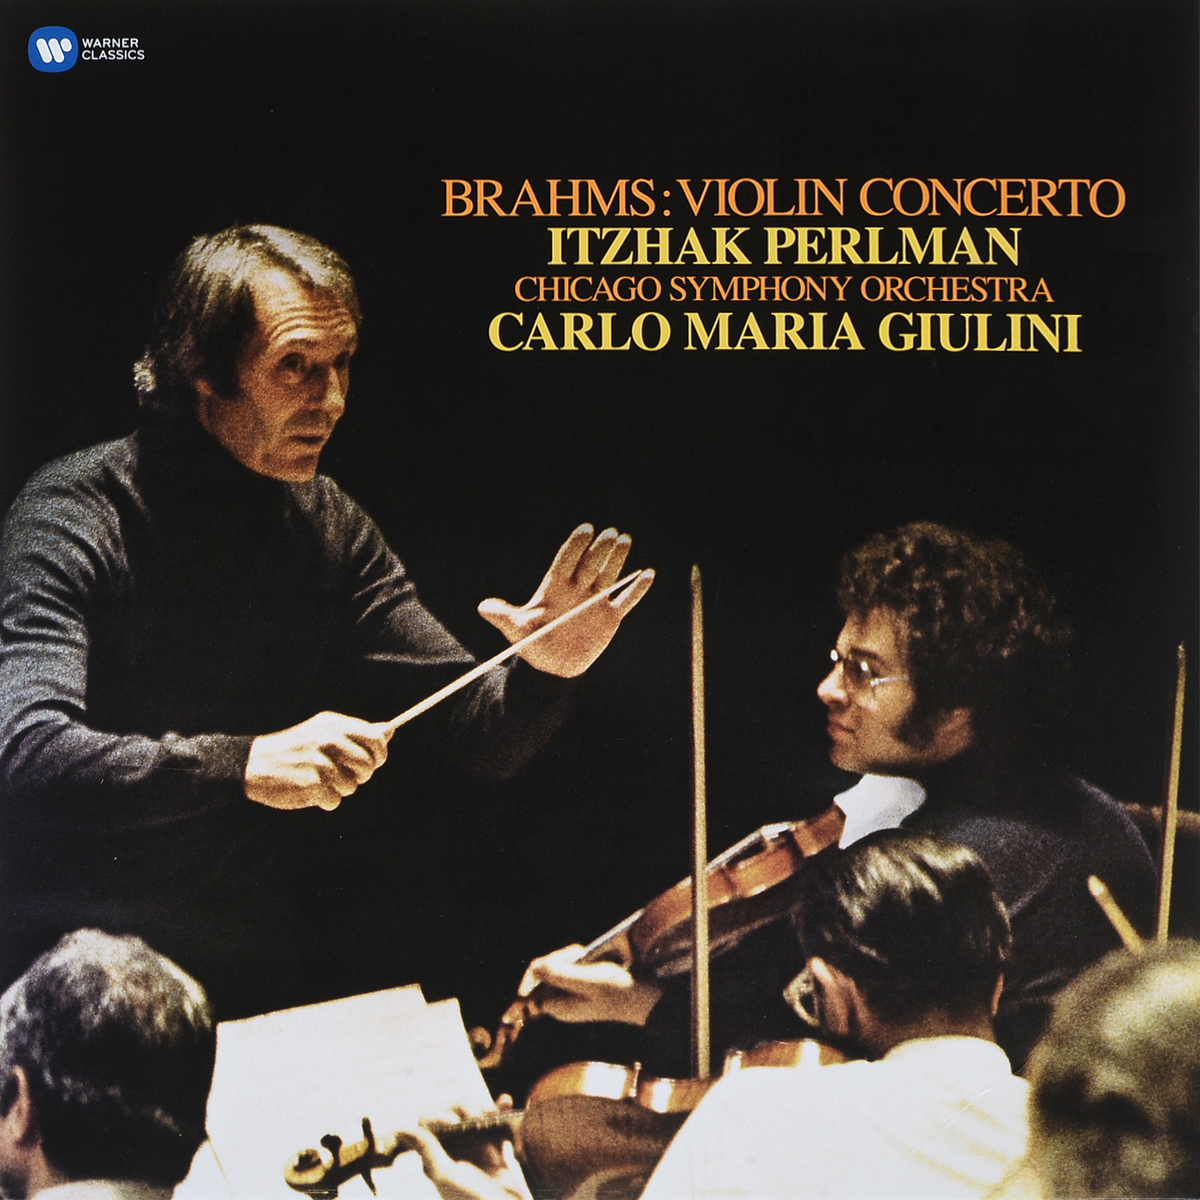 лучшая цена Ицхак Перлман,Карло Джулини,Chicago Symphony Orchestra Itzhak Perlman, Carlo Maria Giulini. Brahms. Violin Concerto (LP)